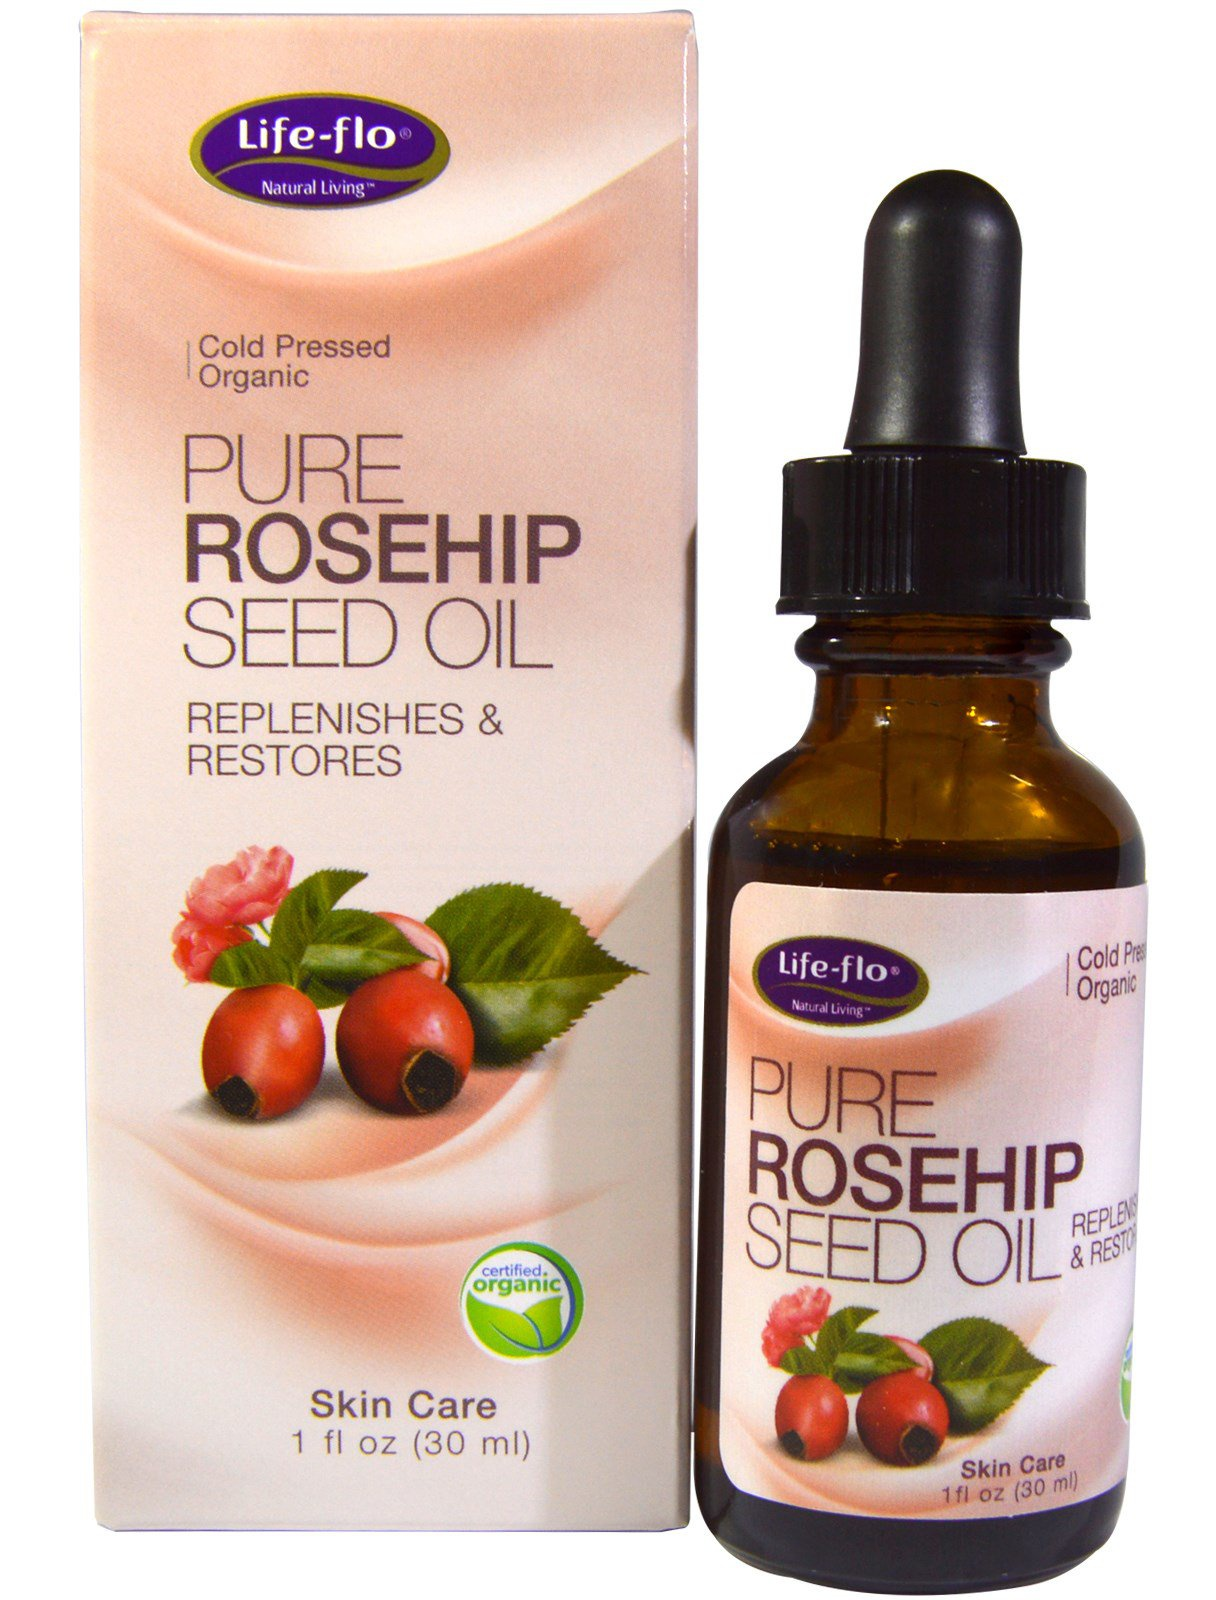 Life-flo Pure Rosehip Seed Oil